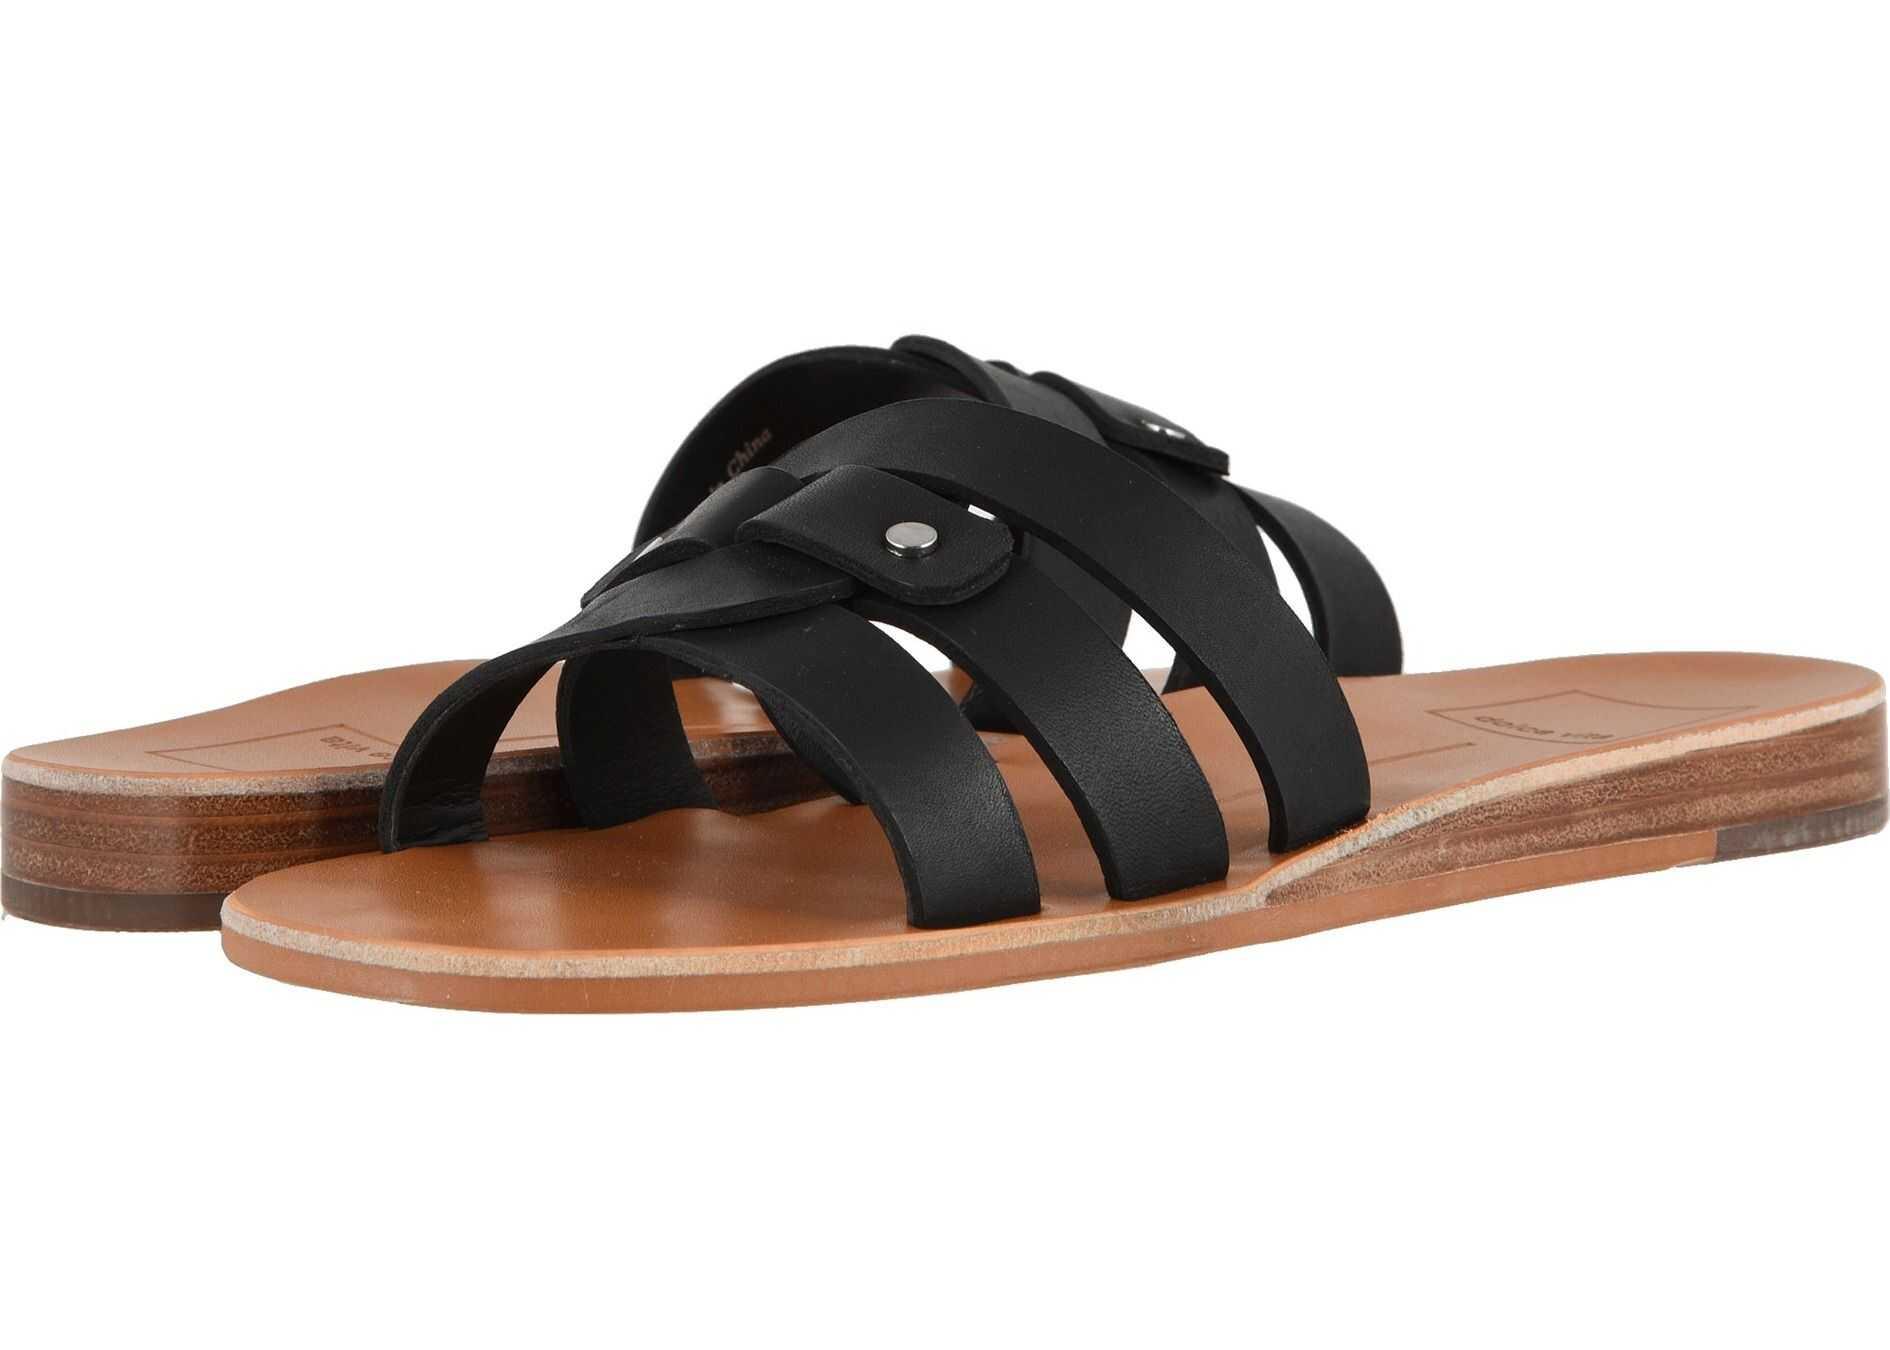 Dolce Vita Cait Black Leather